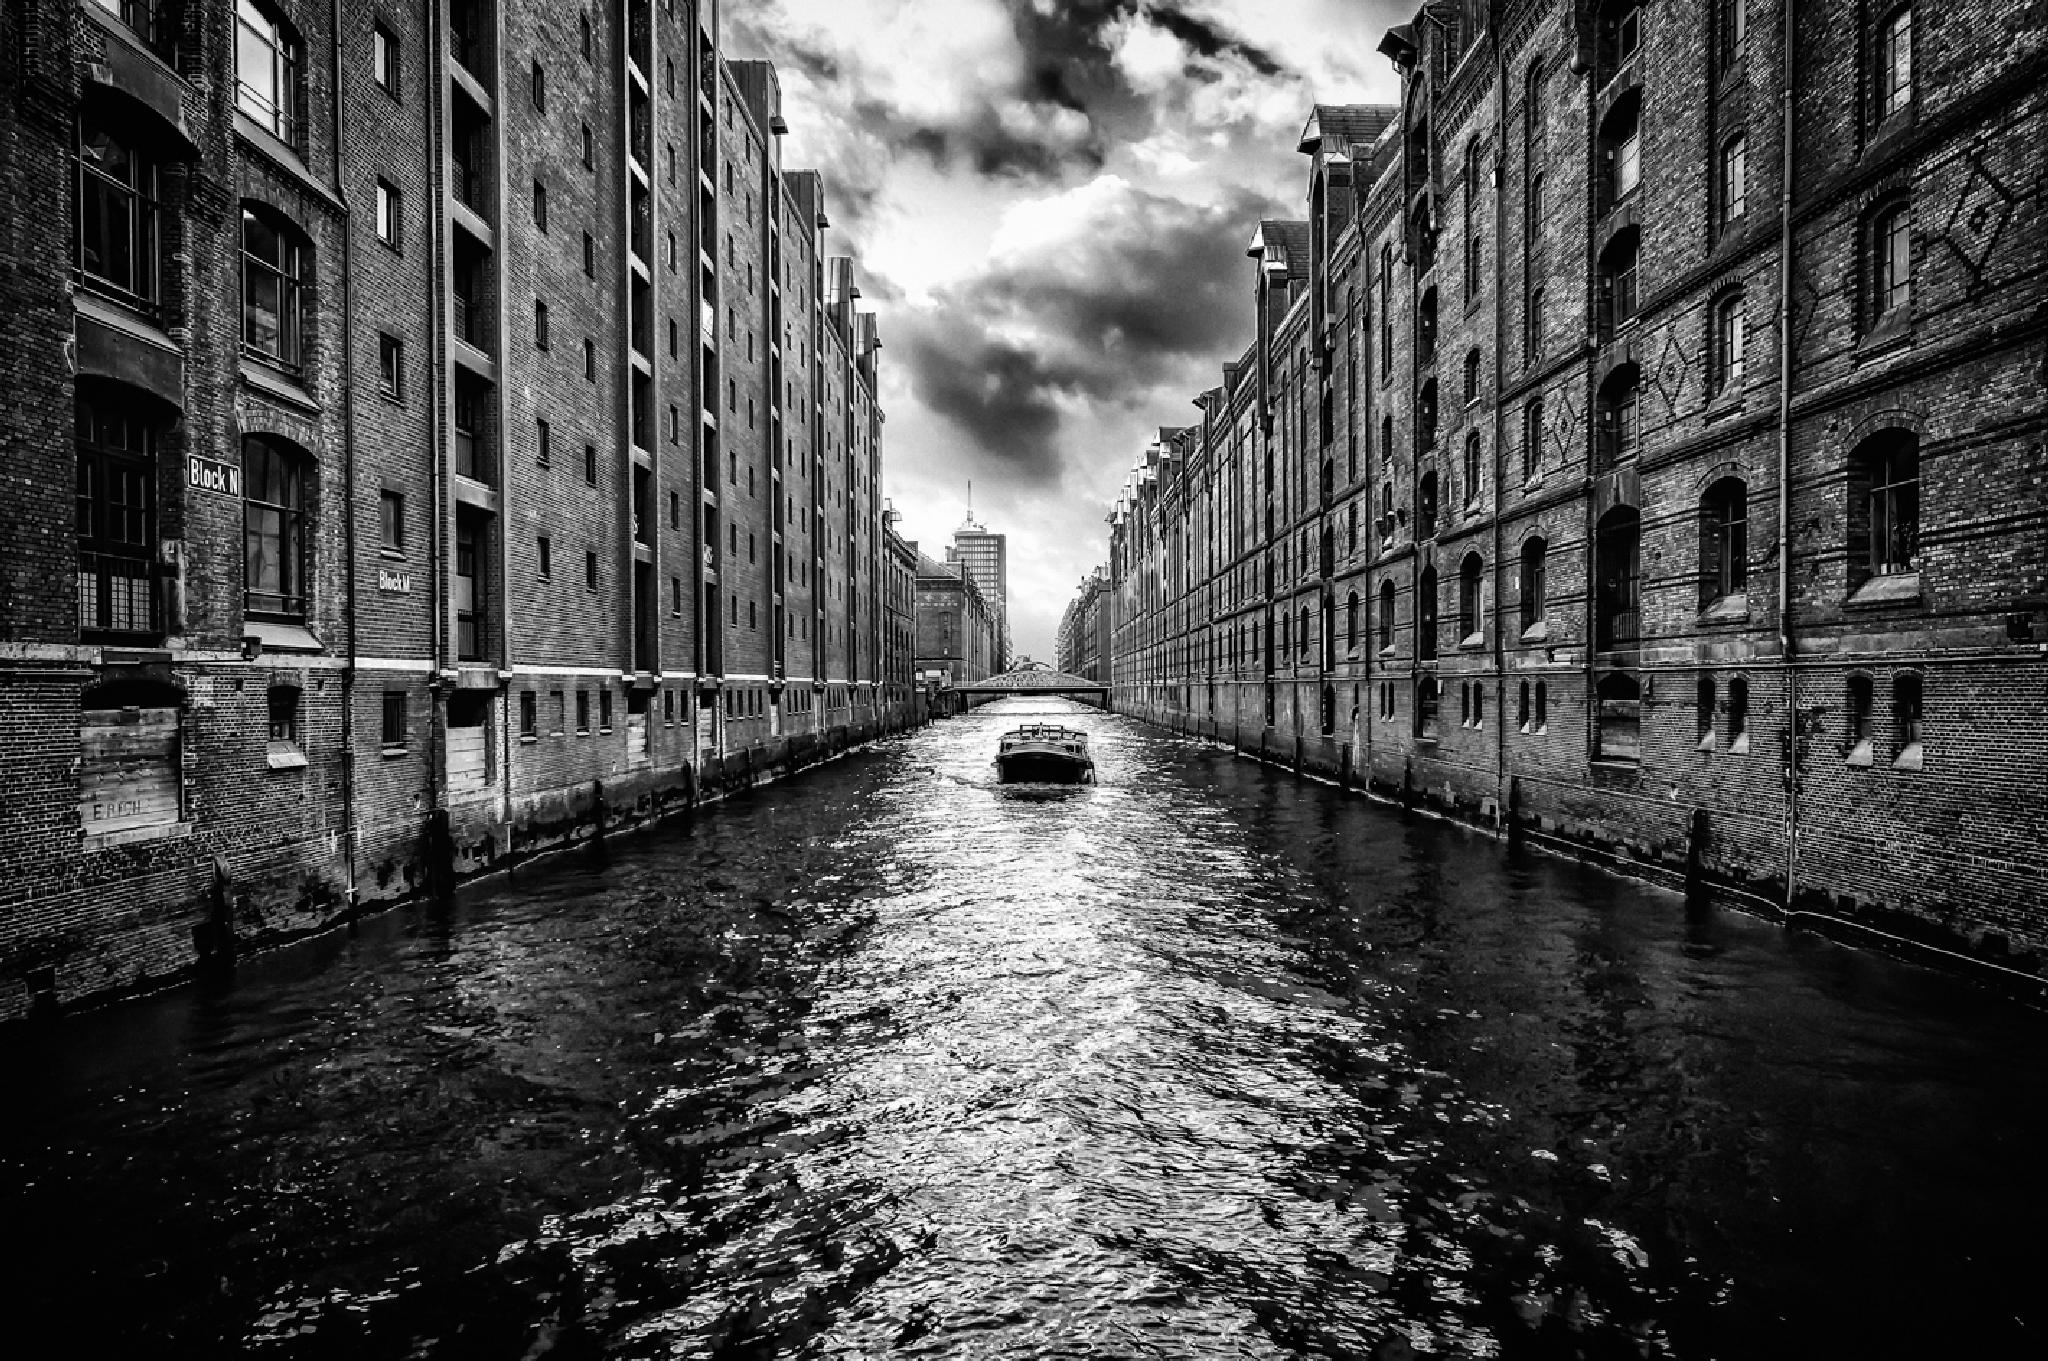 Hamburg Hafen City by Joerg Piechotka